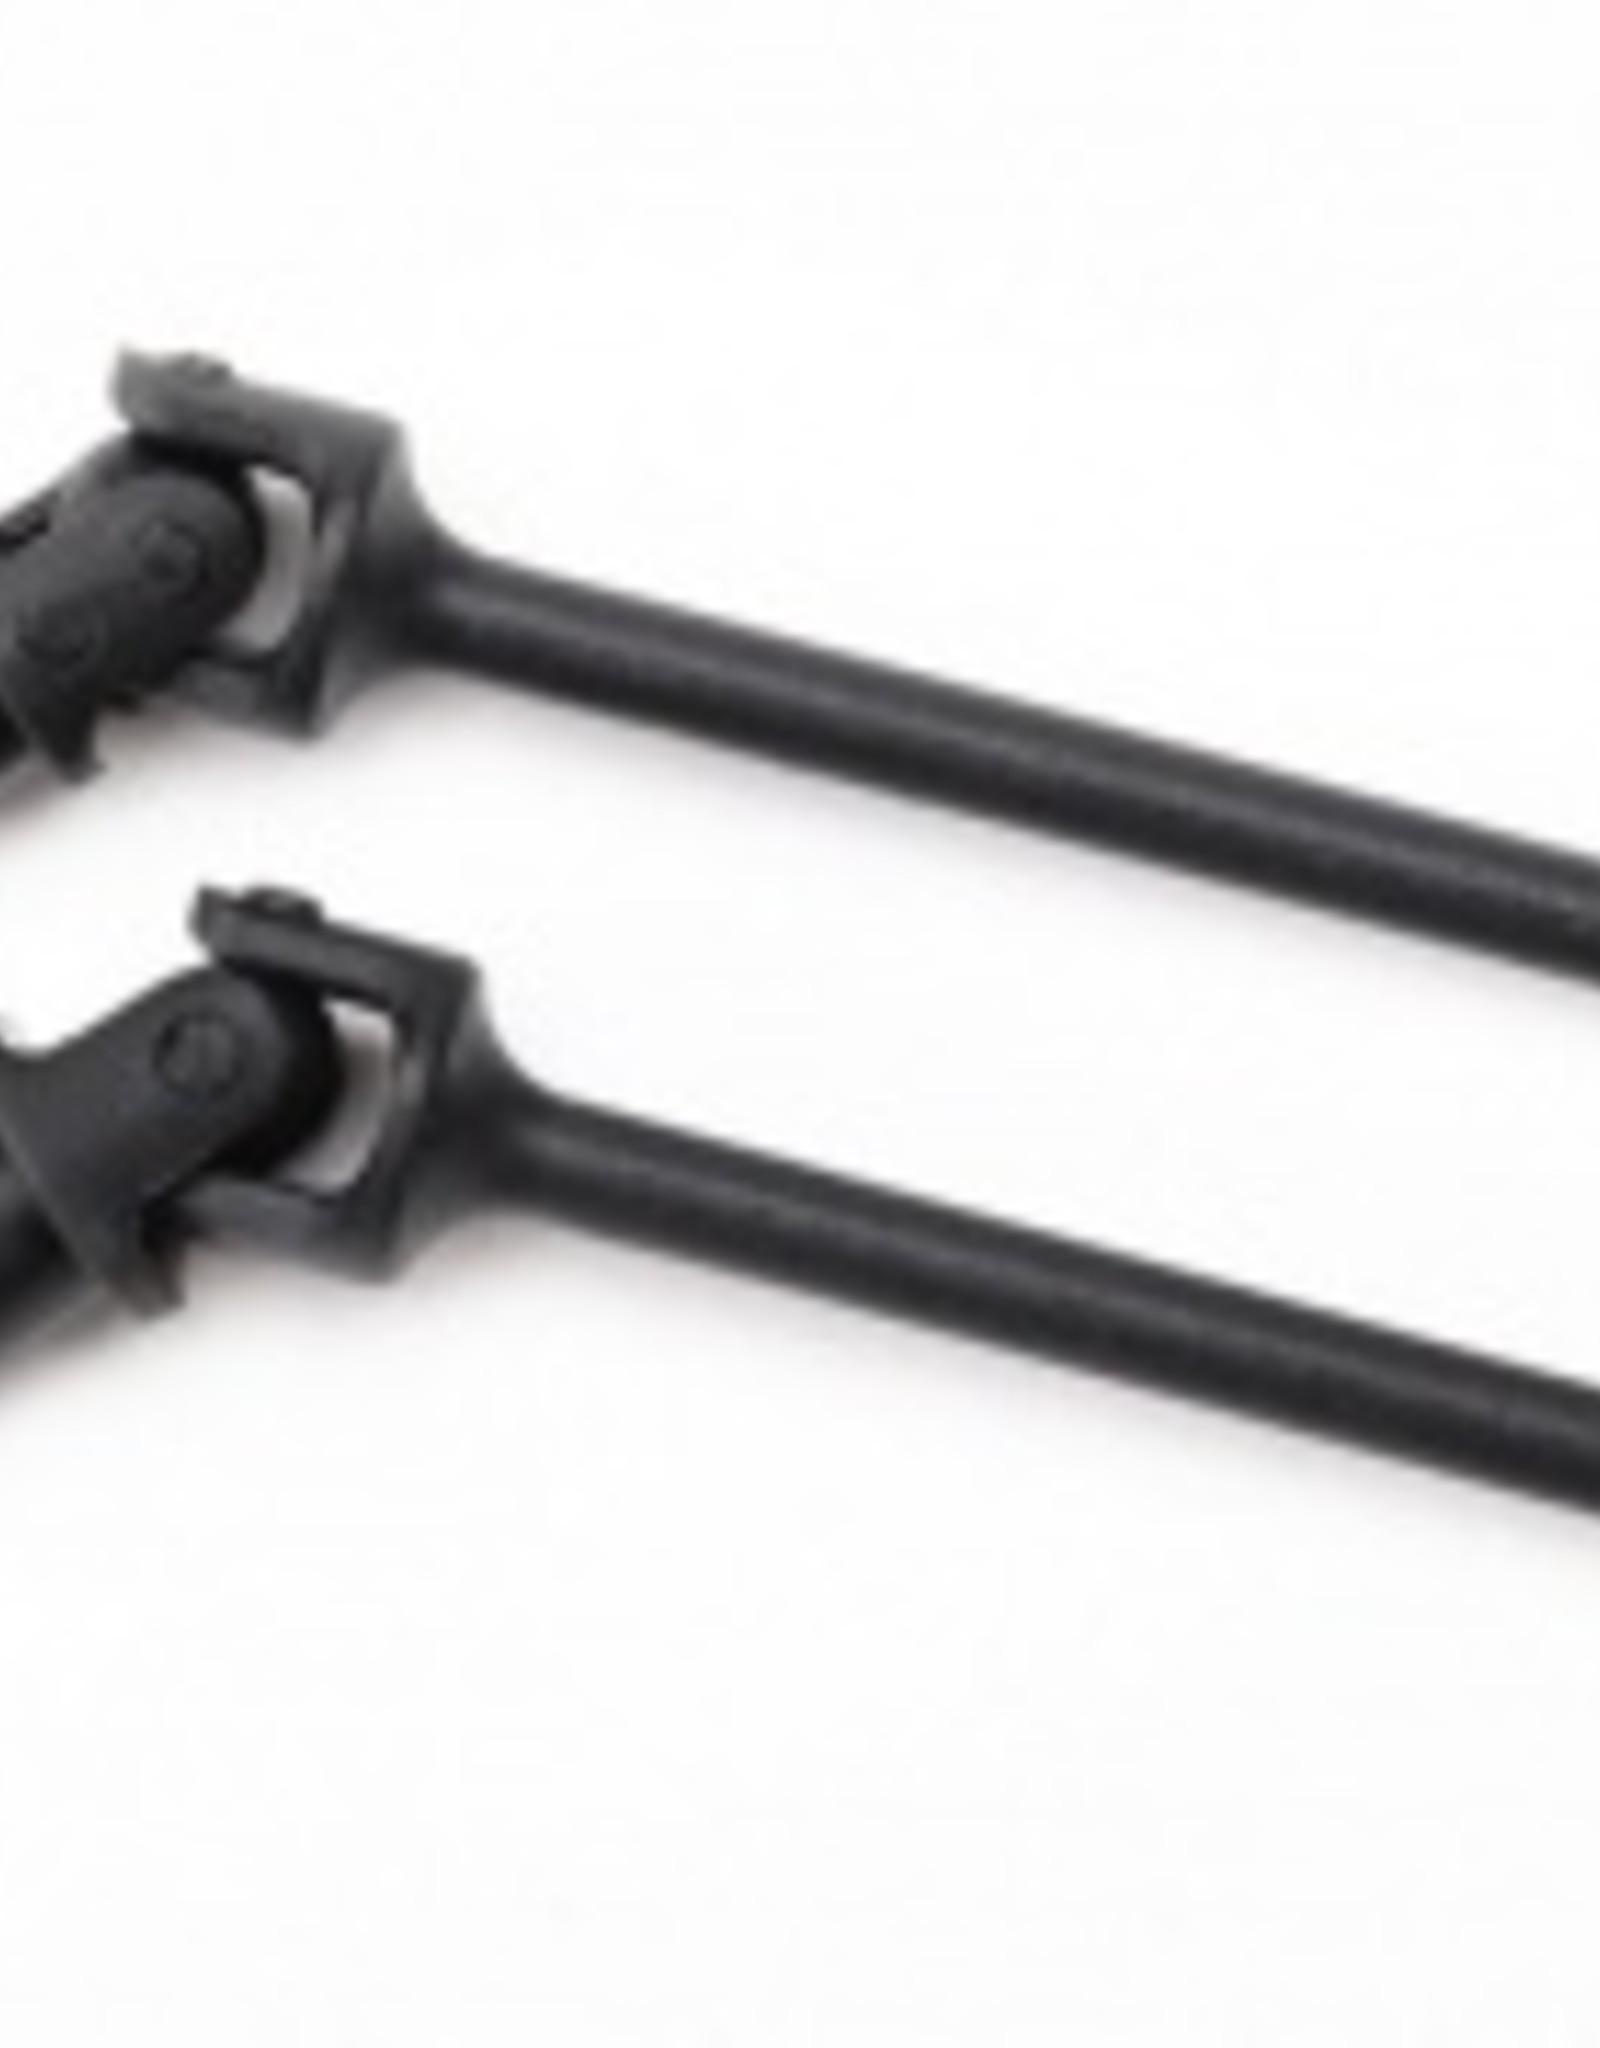 Traxxas LaTrax Teton/ SST Driveshaft assembly, front /rear (2)